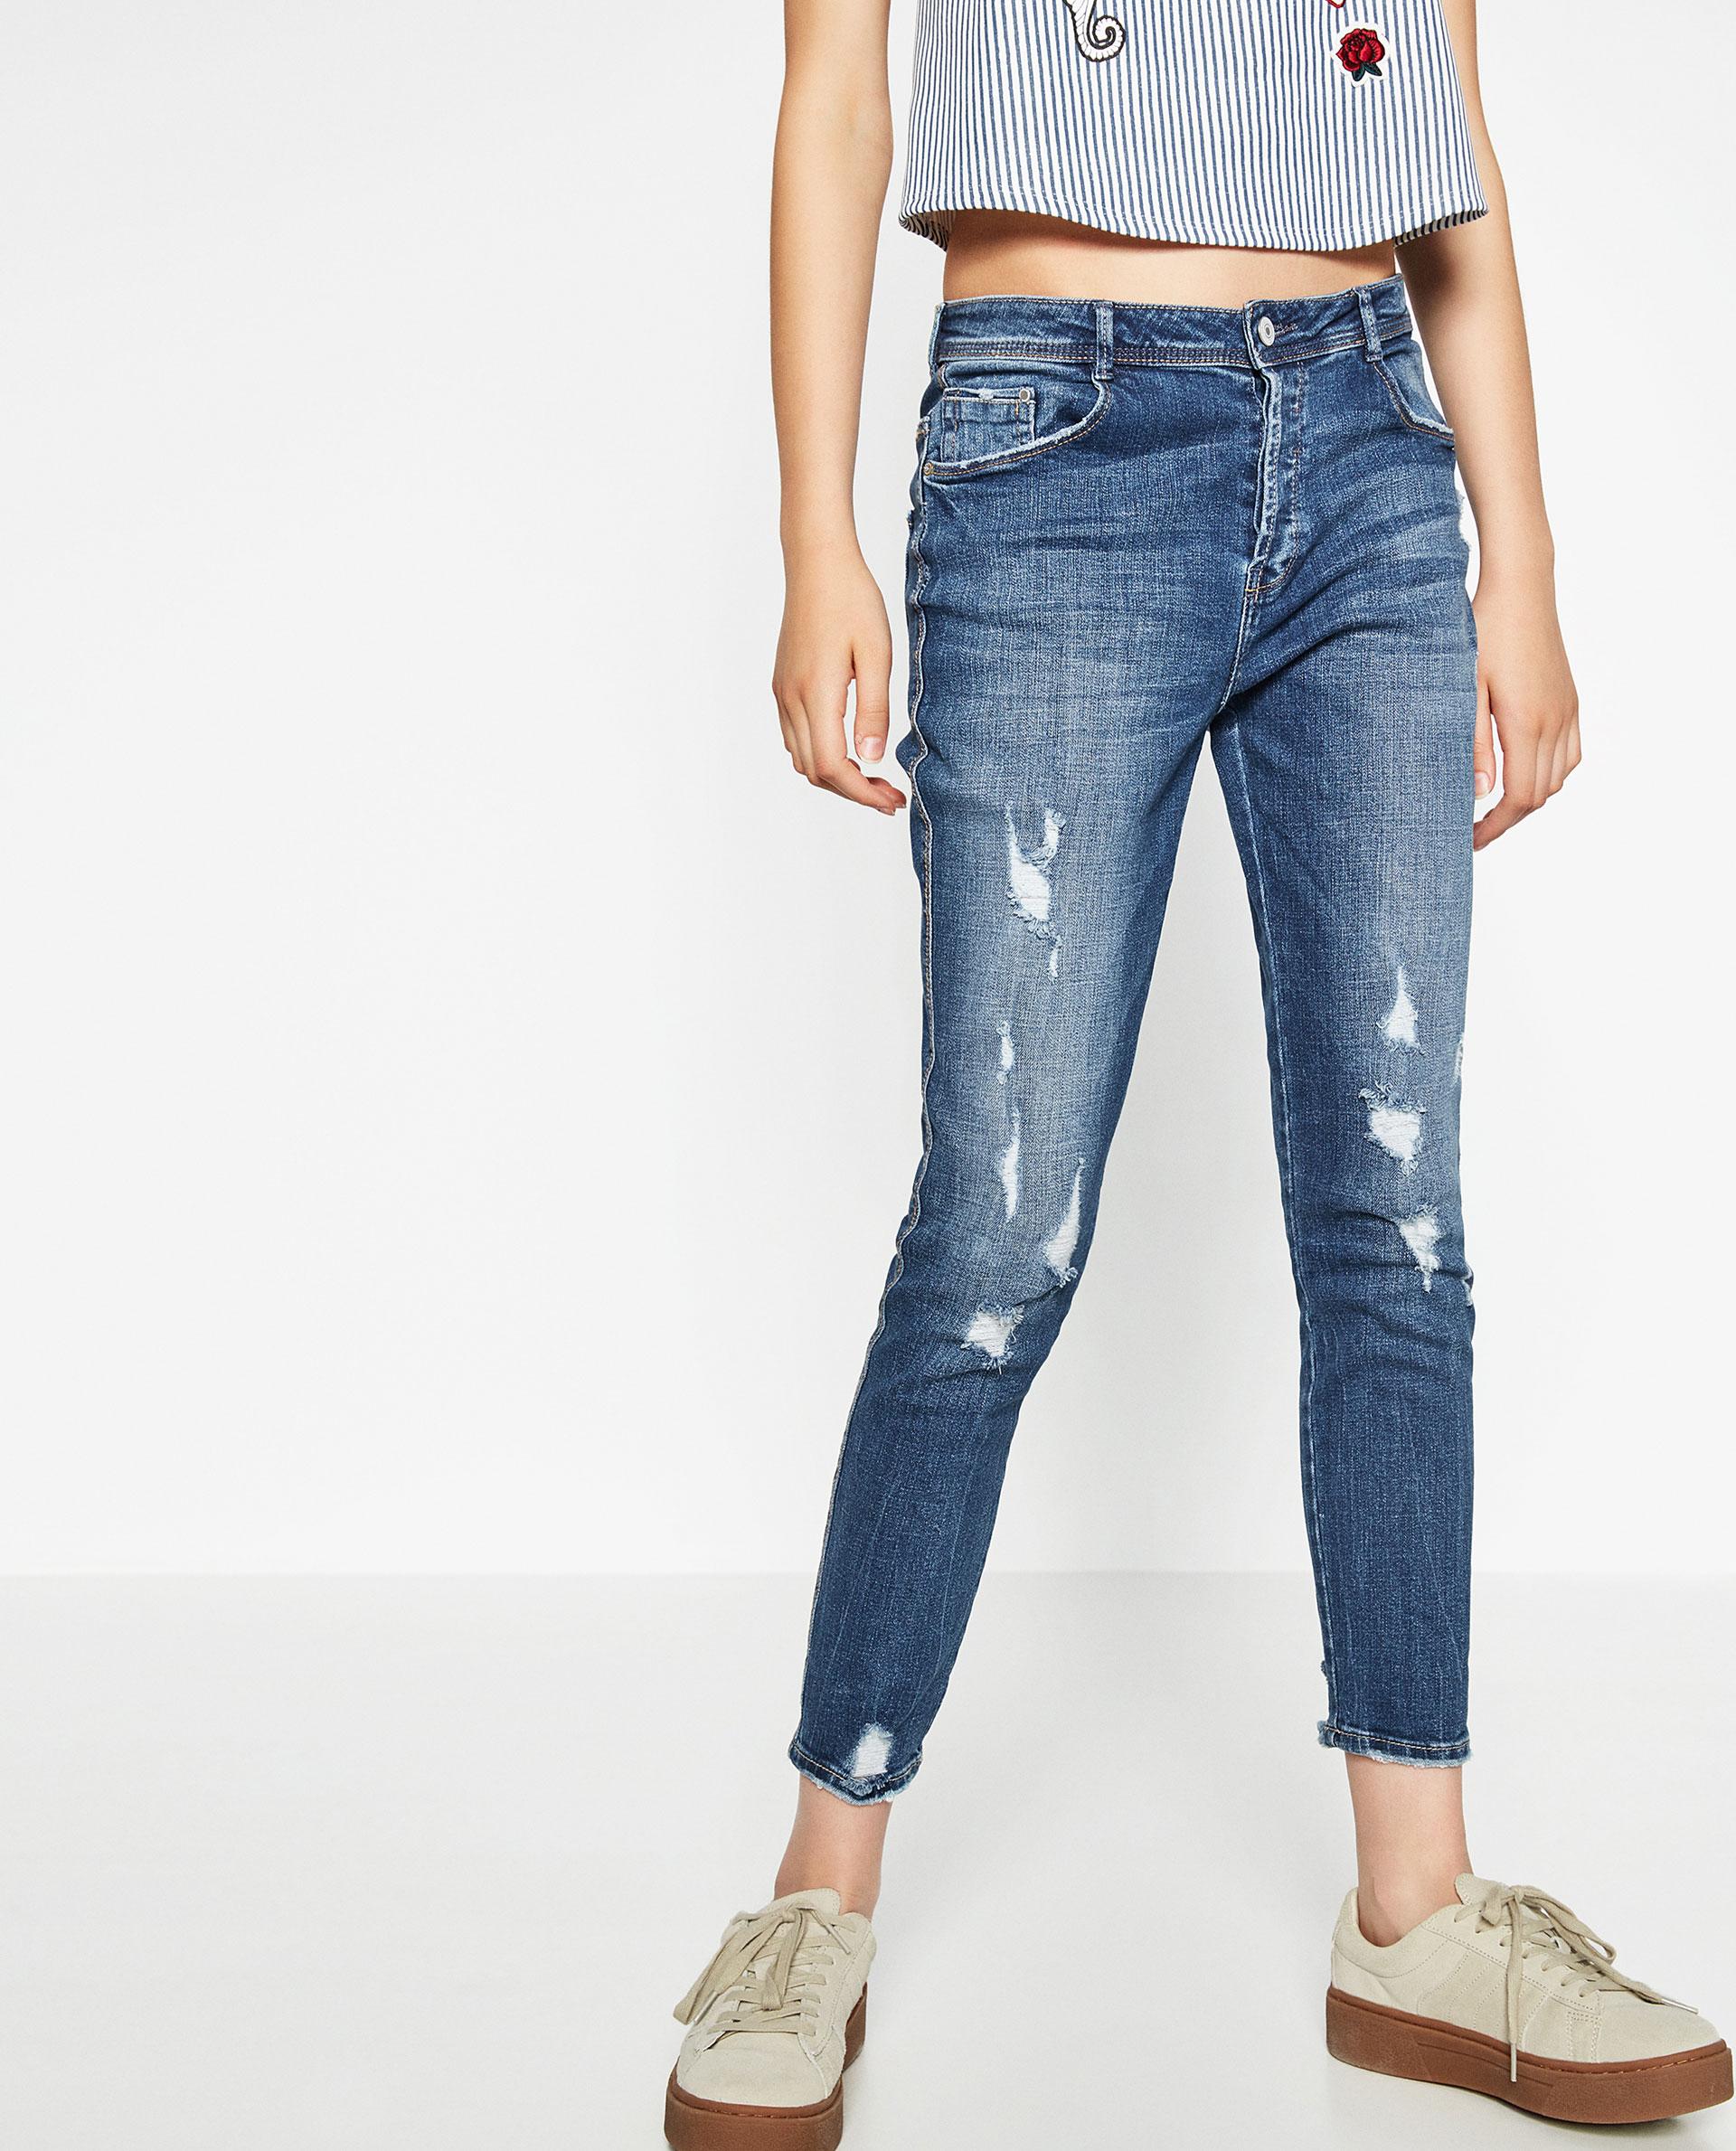 2fd11e60 High waist ripped jeans zara – Super Jeans in dieser Saison